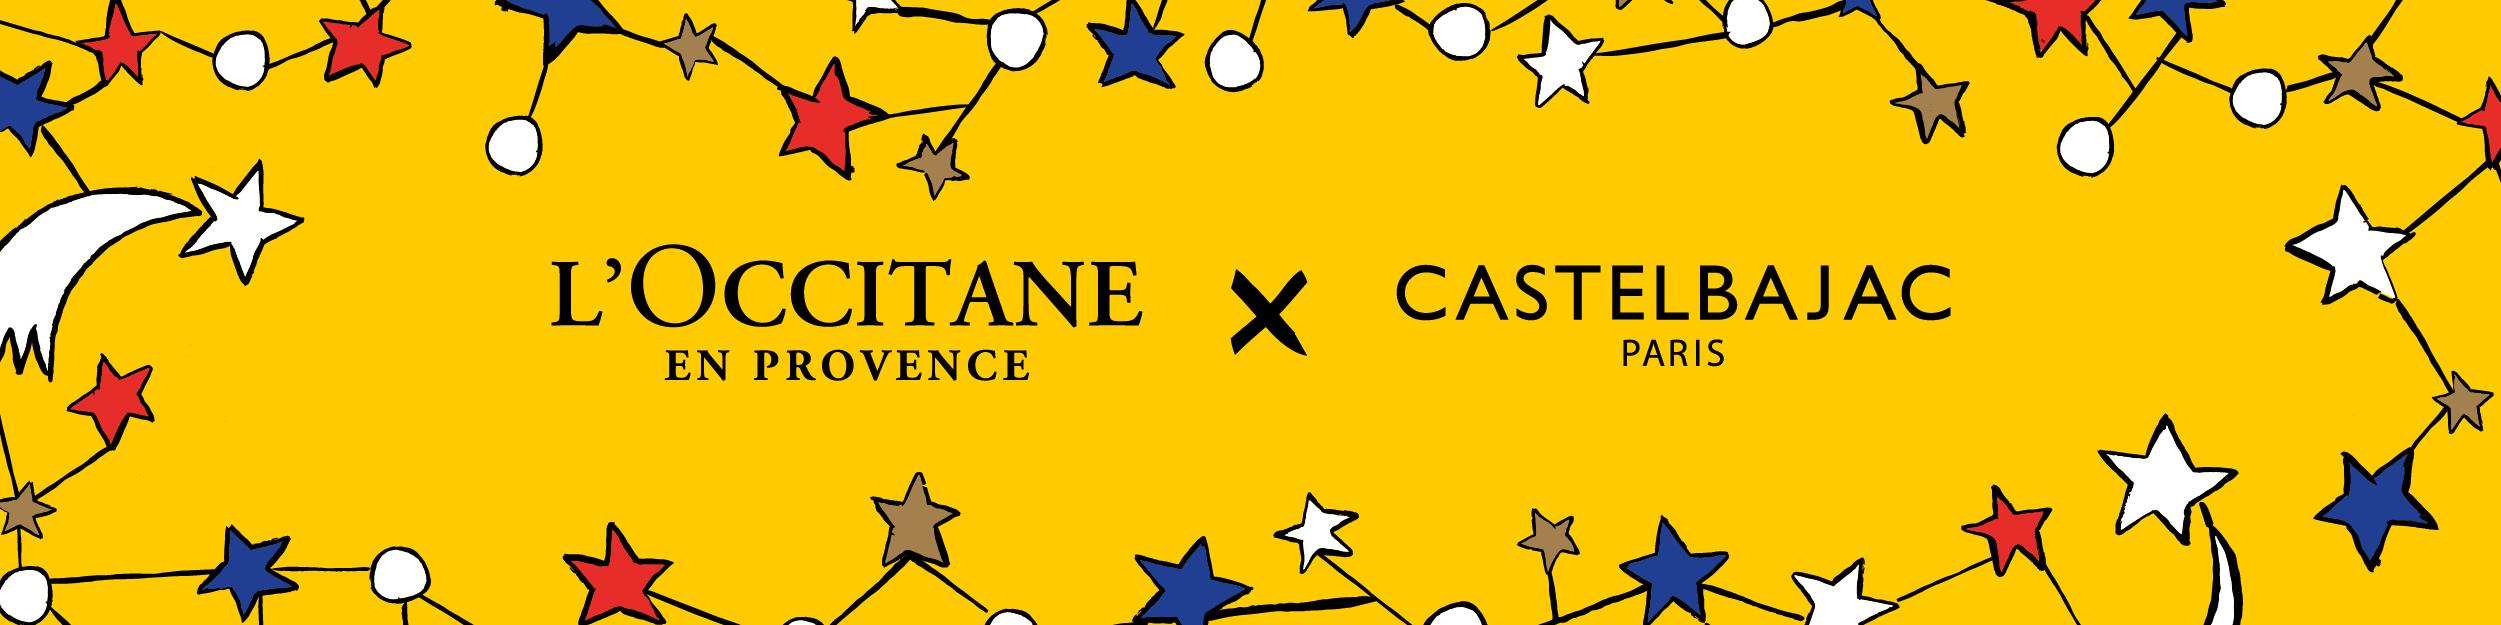 L'Occitane x Castelbajac Paris